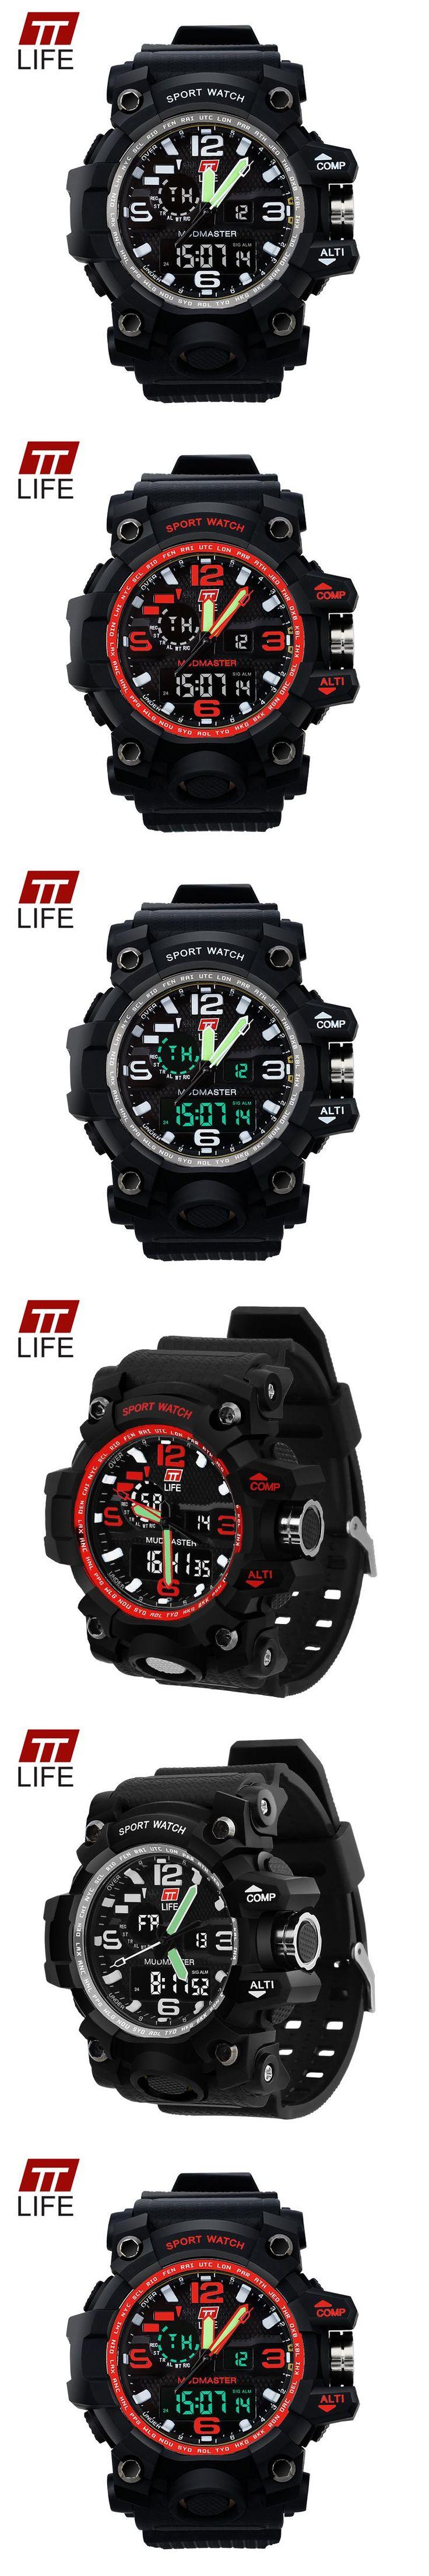 TTLIFE Men Popular LED Display Watch 30M Waterproof Sports Watch Fashion Military Army Large Dial Analog Digital Wristwatch